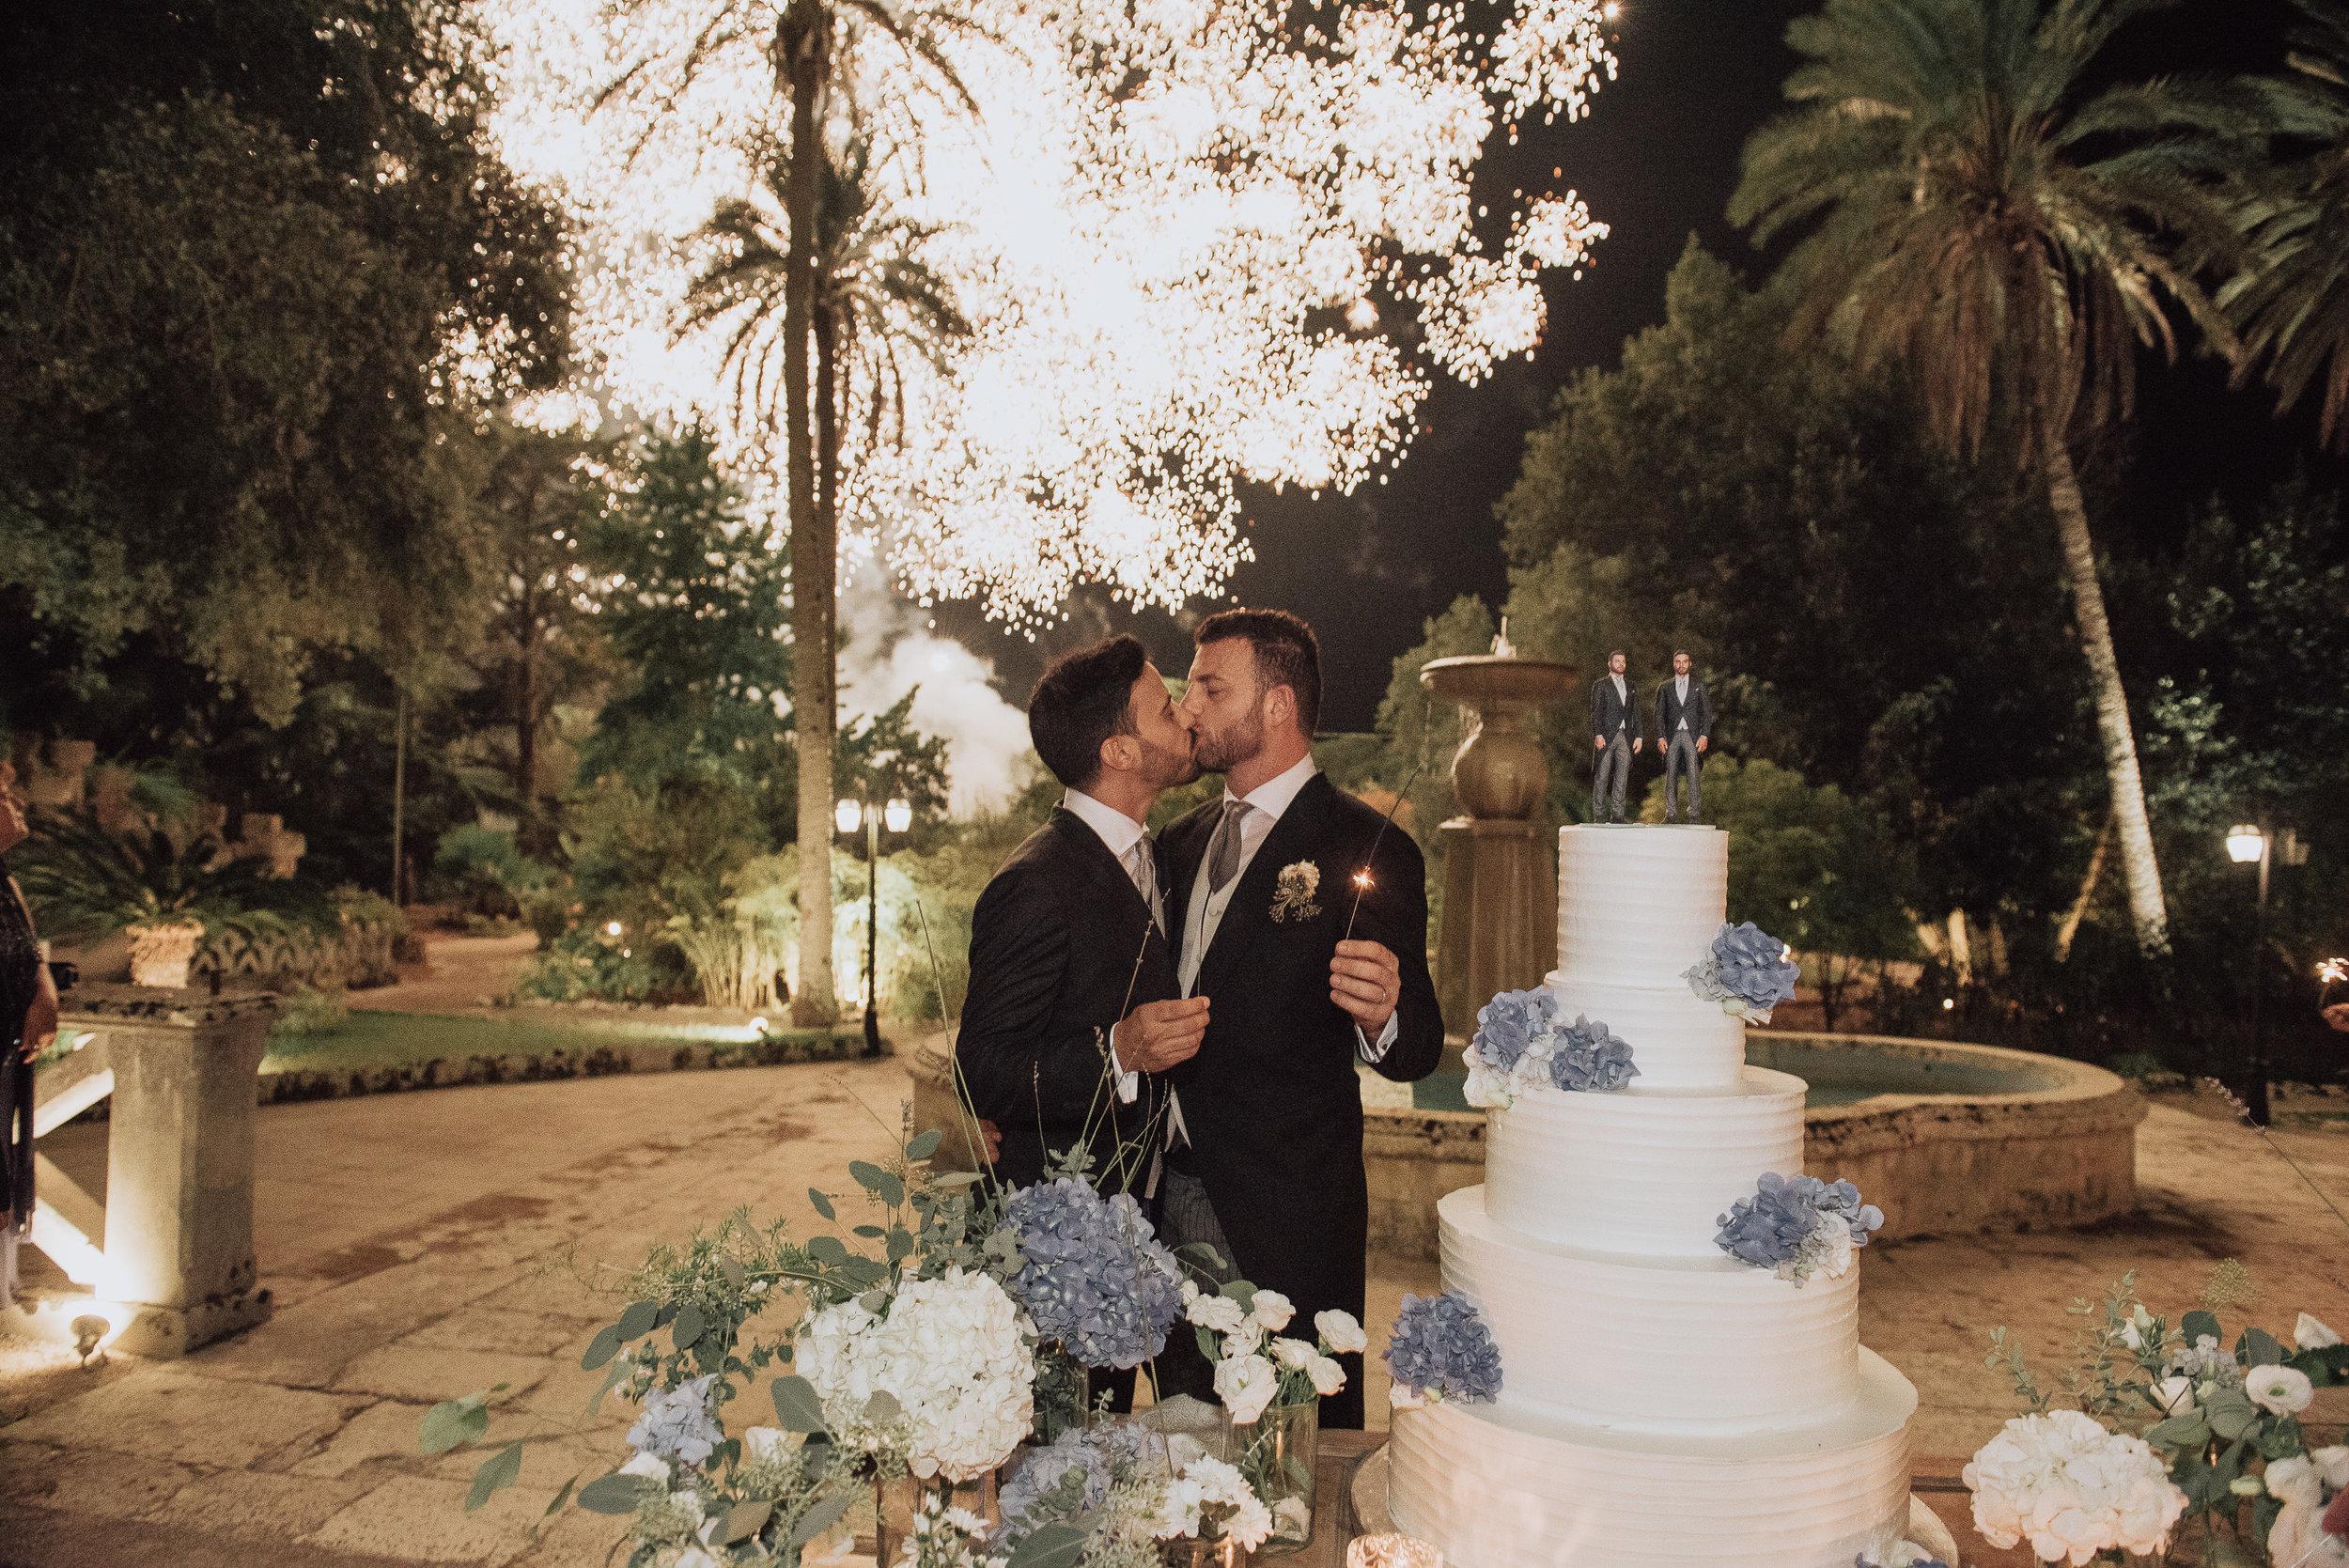 same-sex wedding_mr-theodore_melbourne wedding directory.jpg